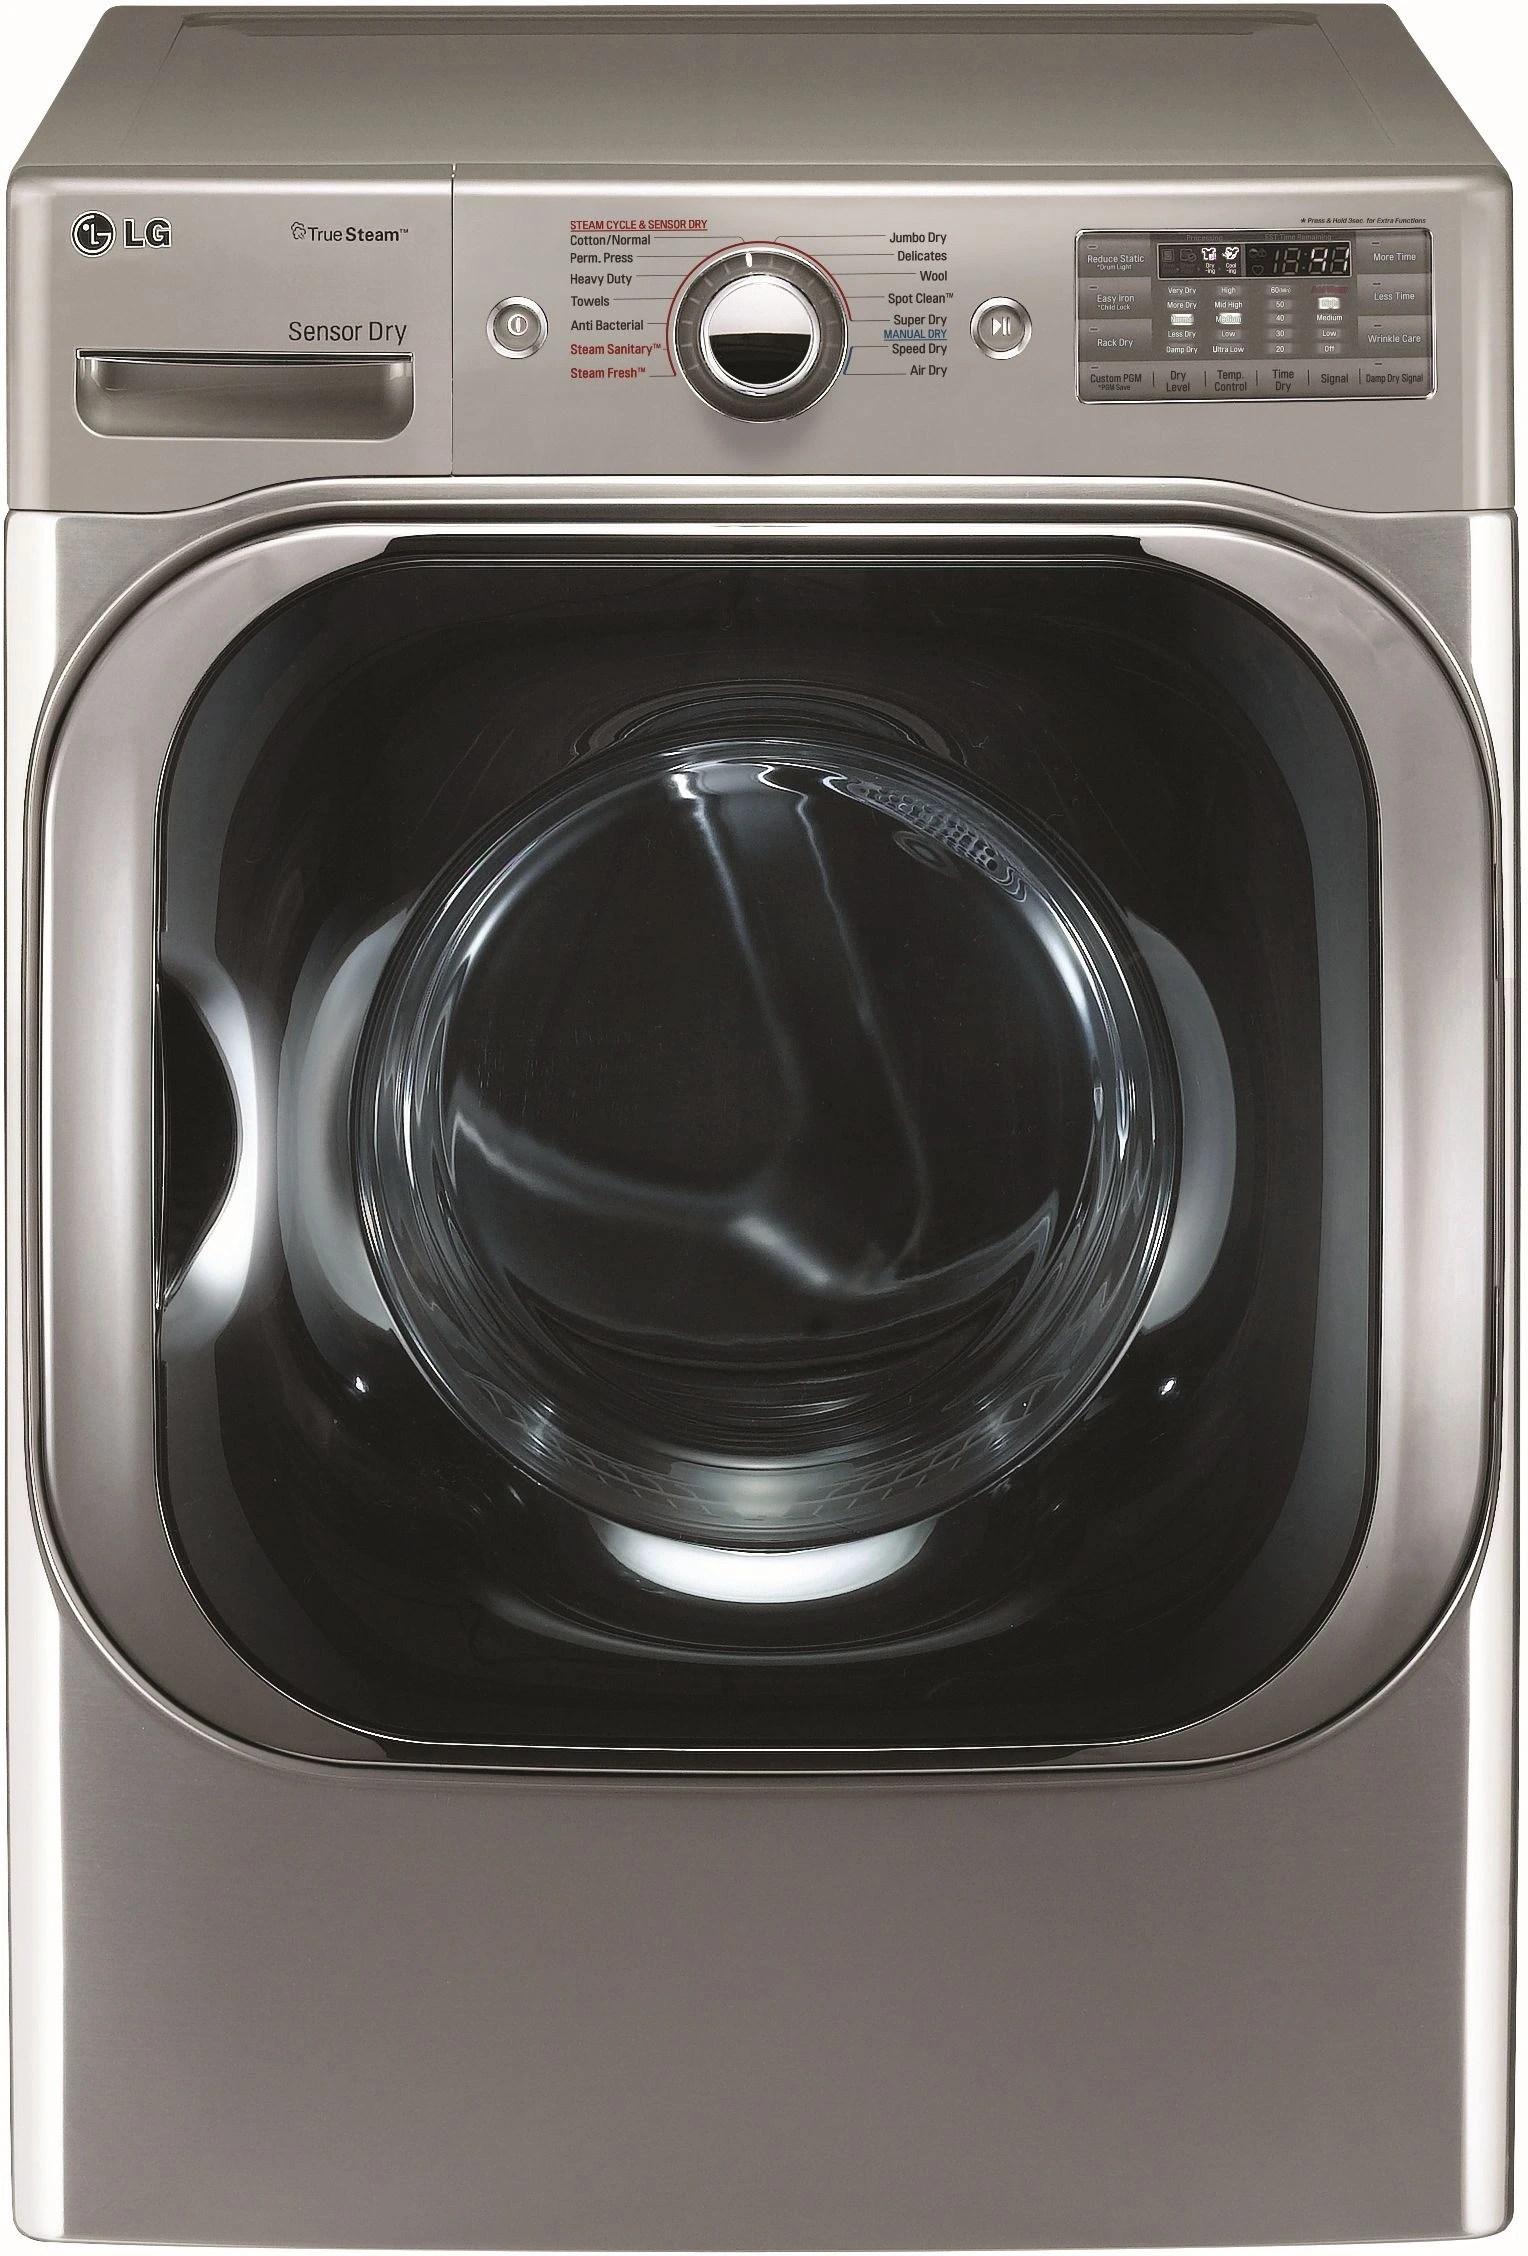 hight resolution of lg front load electric dryer graphite steel dlex8100v